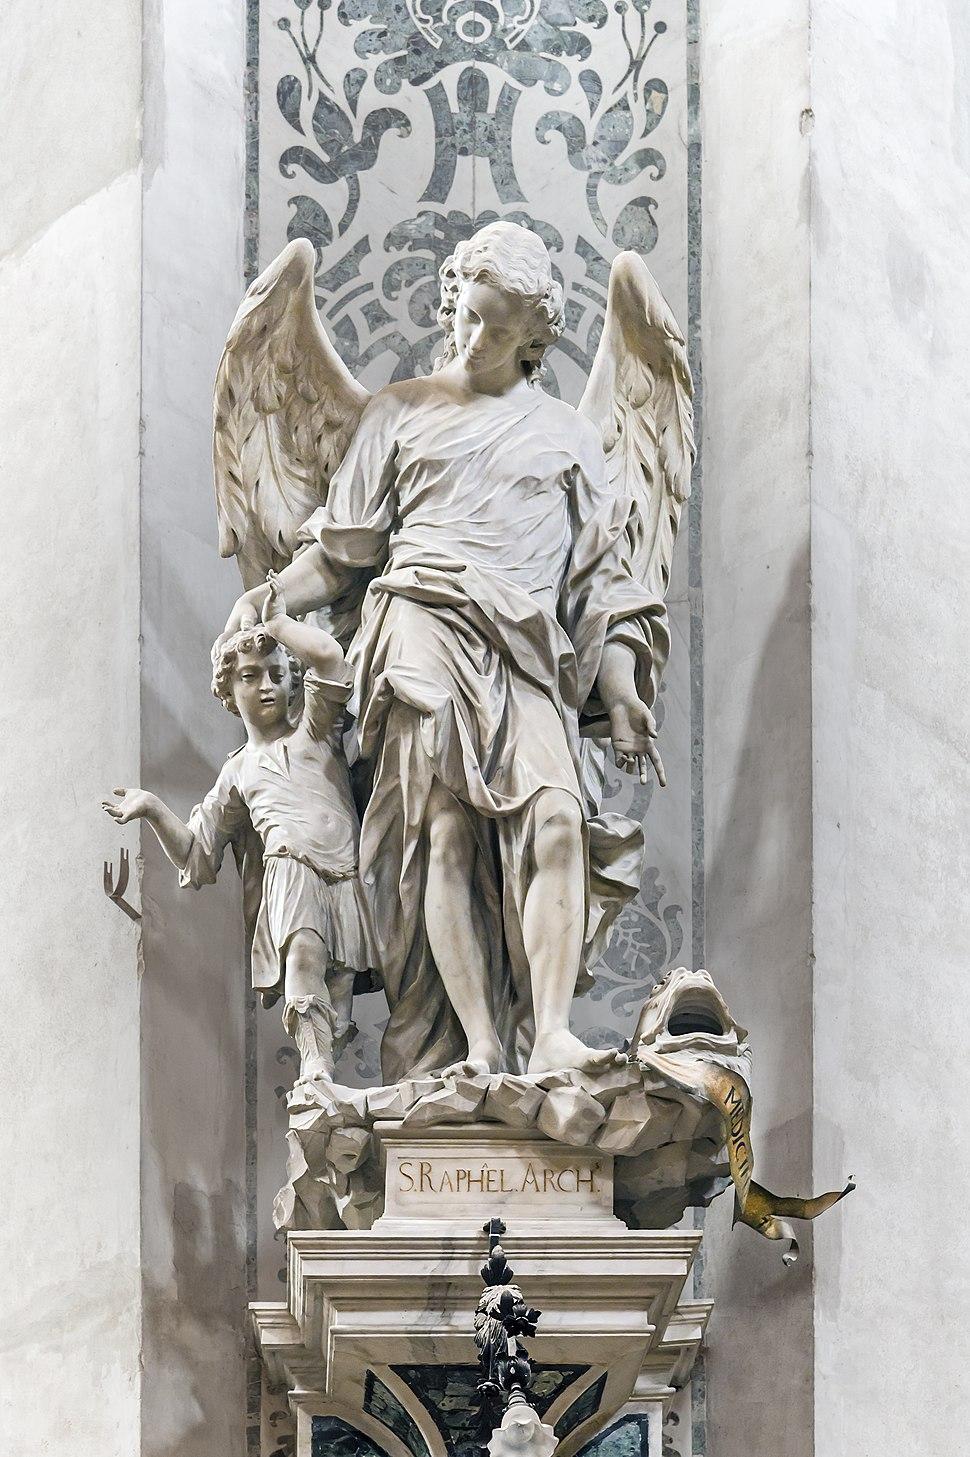 Interior of Chiesa dei Gesuiti (Venice) - Center of the transept - Archangel Raphael